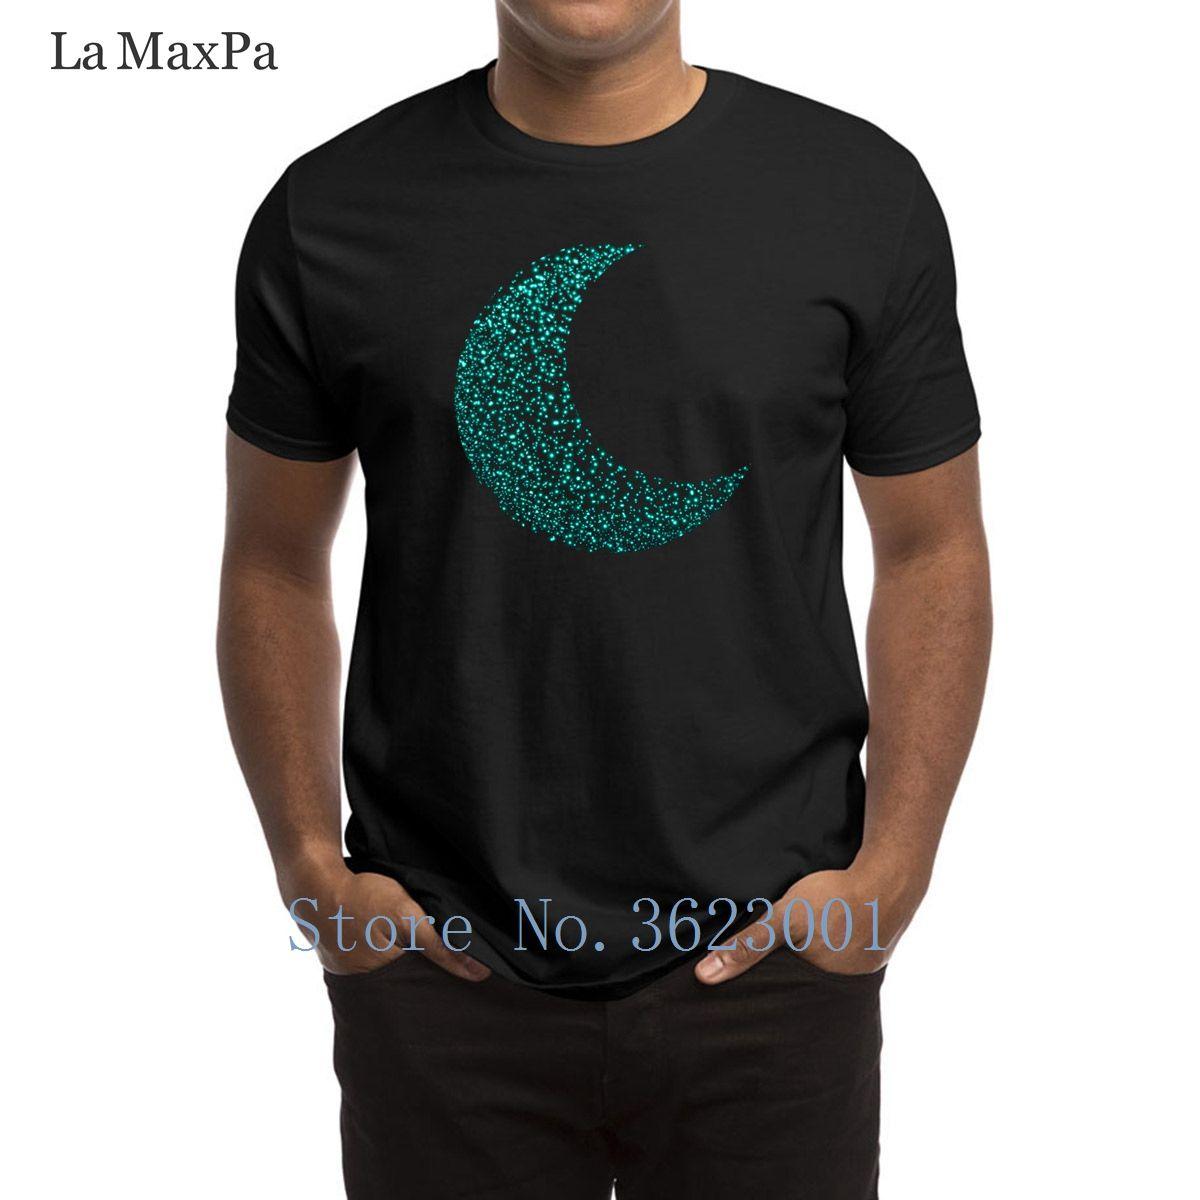 0b056ece89b12 Custom Natural T-Shirt Man Outer Space Glowing Moon Men T Shirt Trendy  Unisex Tee Shirt For Men Better Plus Size Tshirt Man